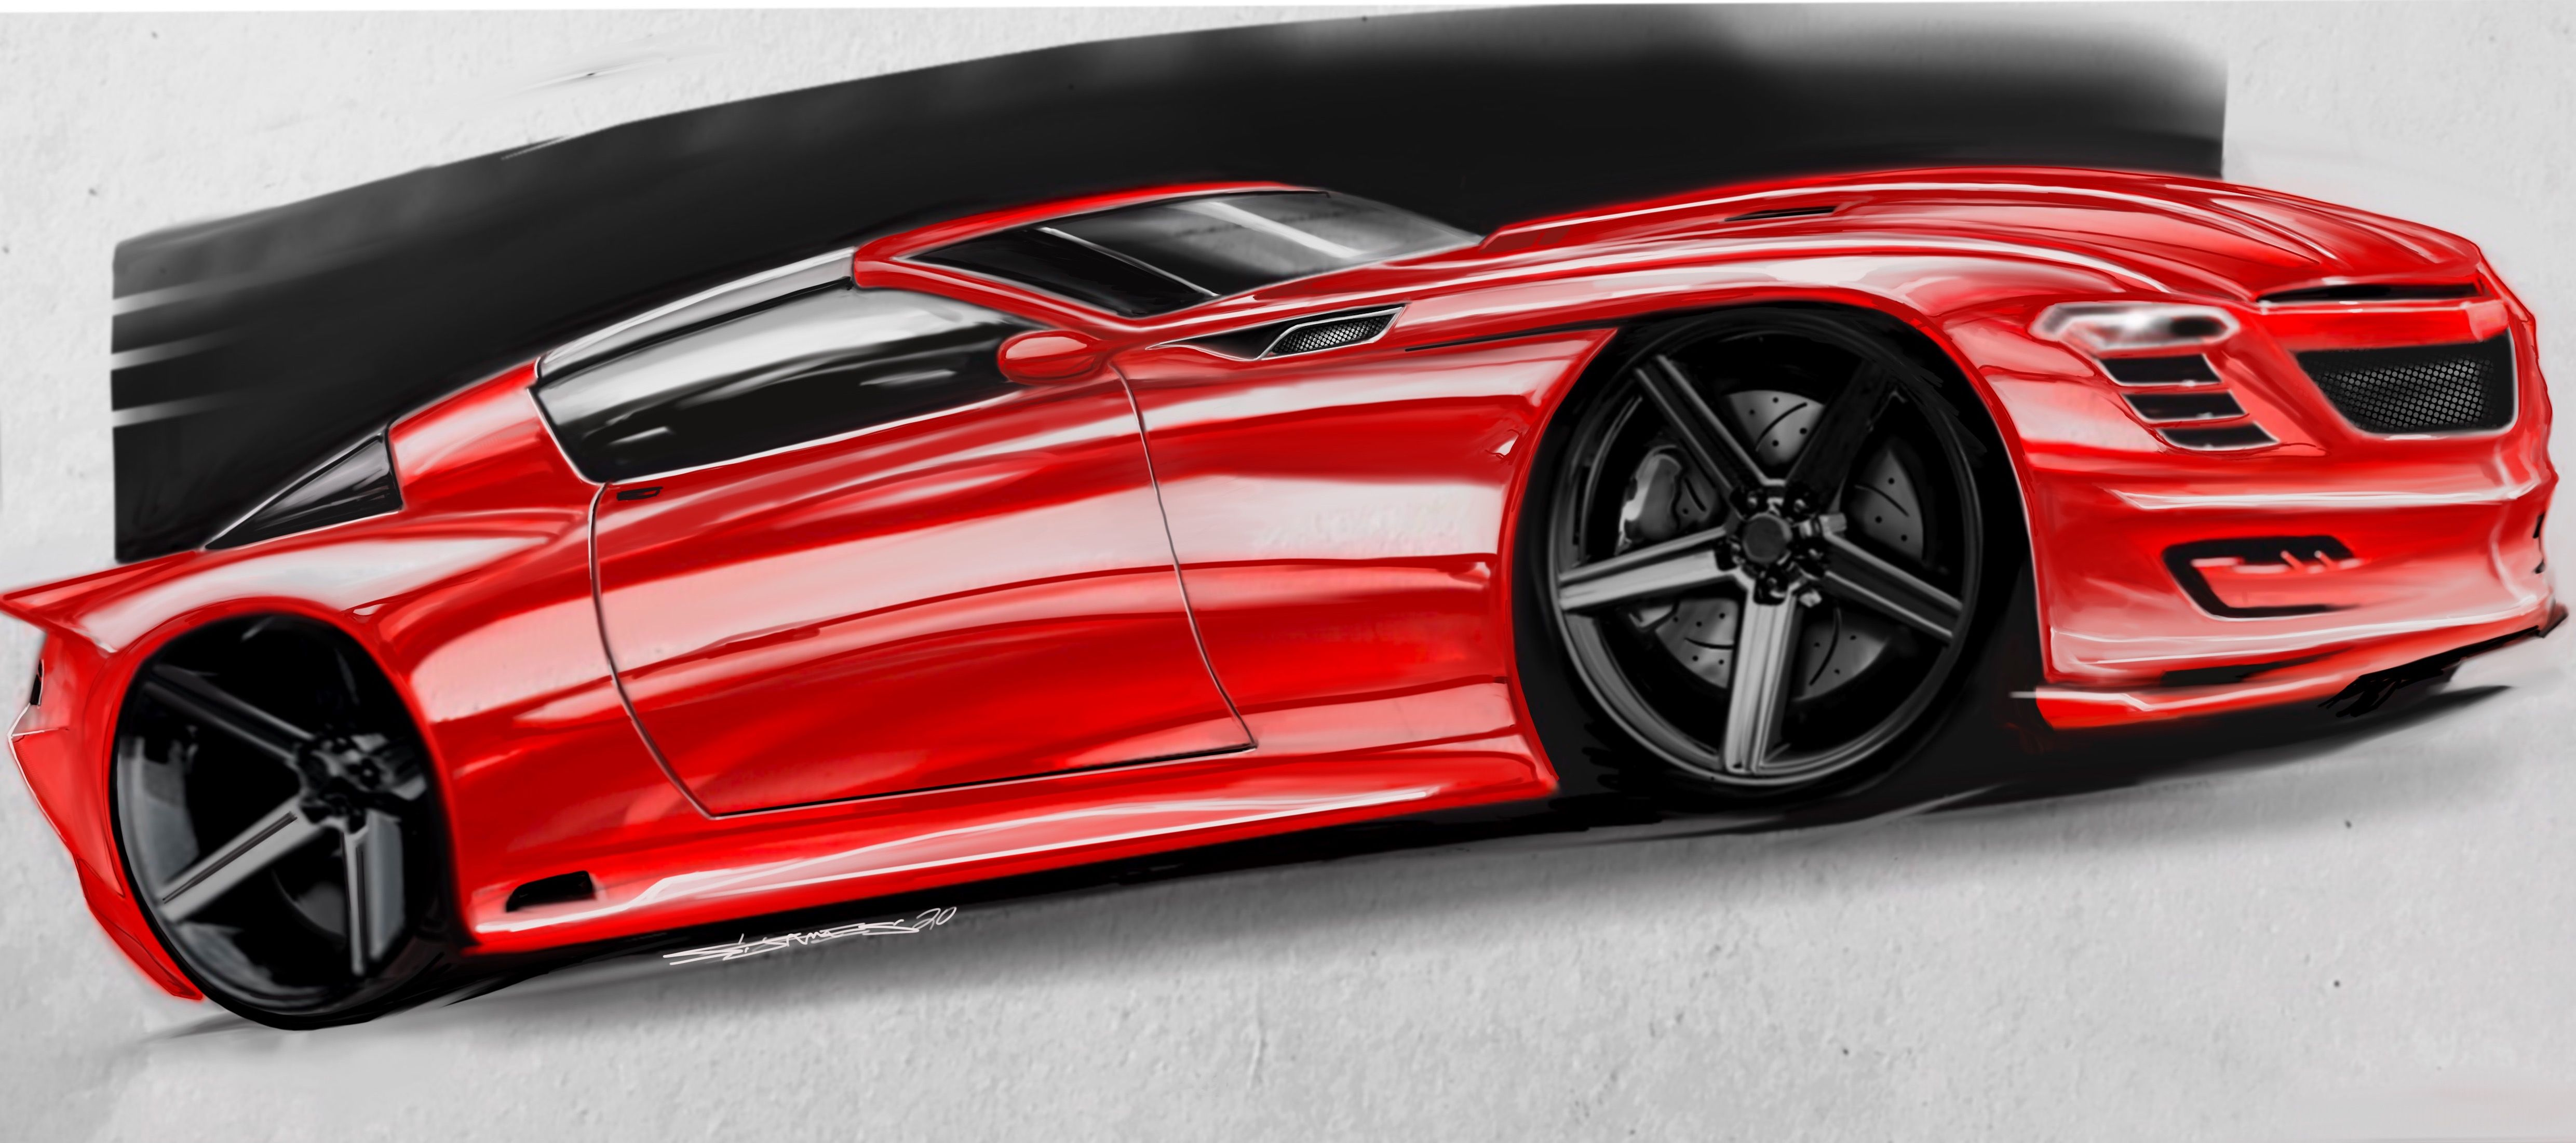 2019 car illustration concept art by automotive artist Sammy James #cardesign #cardesignsketch #cardesigndaily #automotivedesign #camaro #conceptcars #conceptdesign #carart